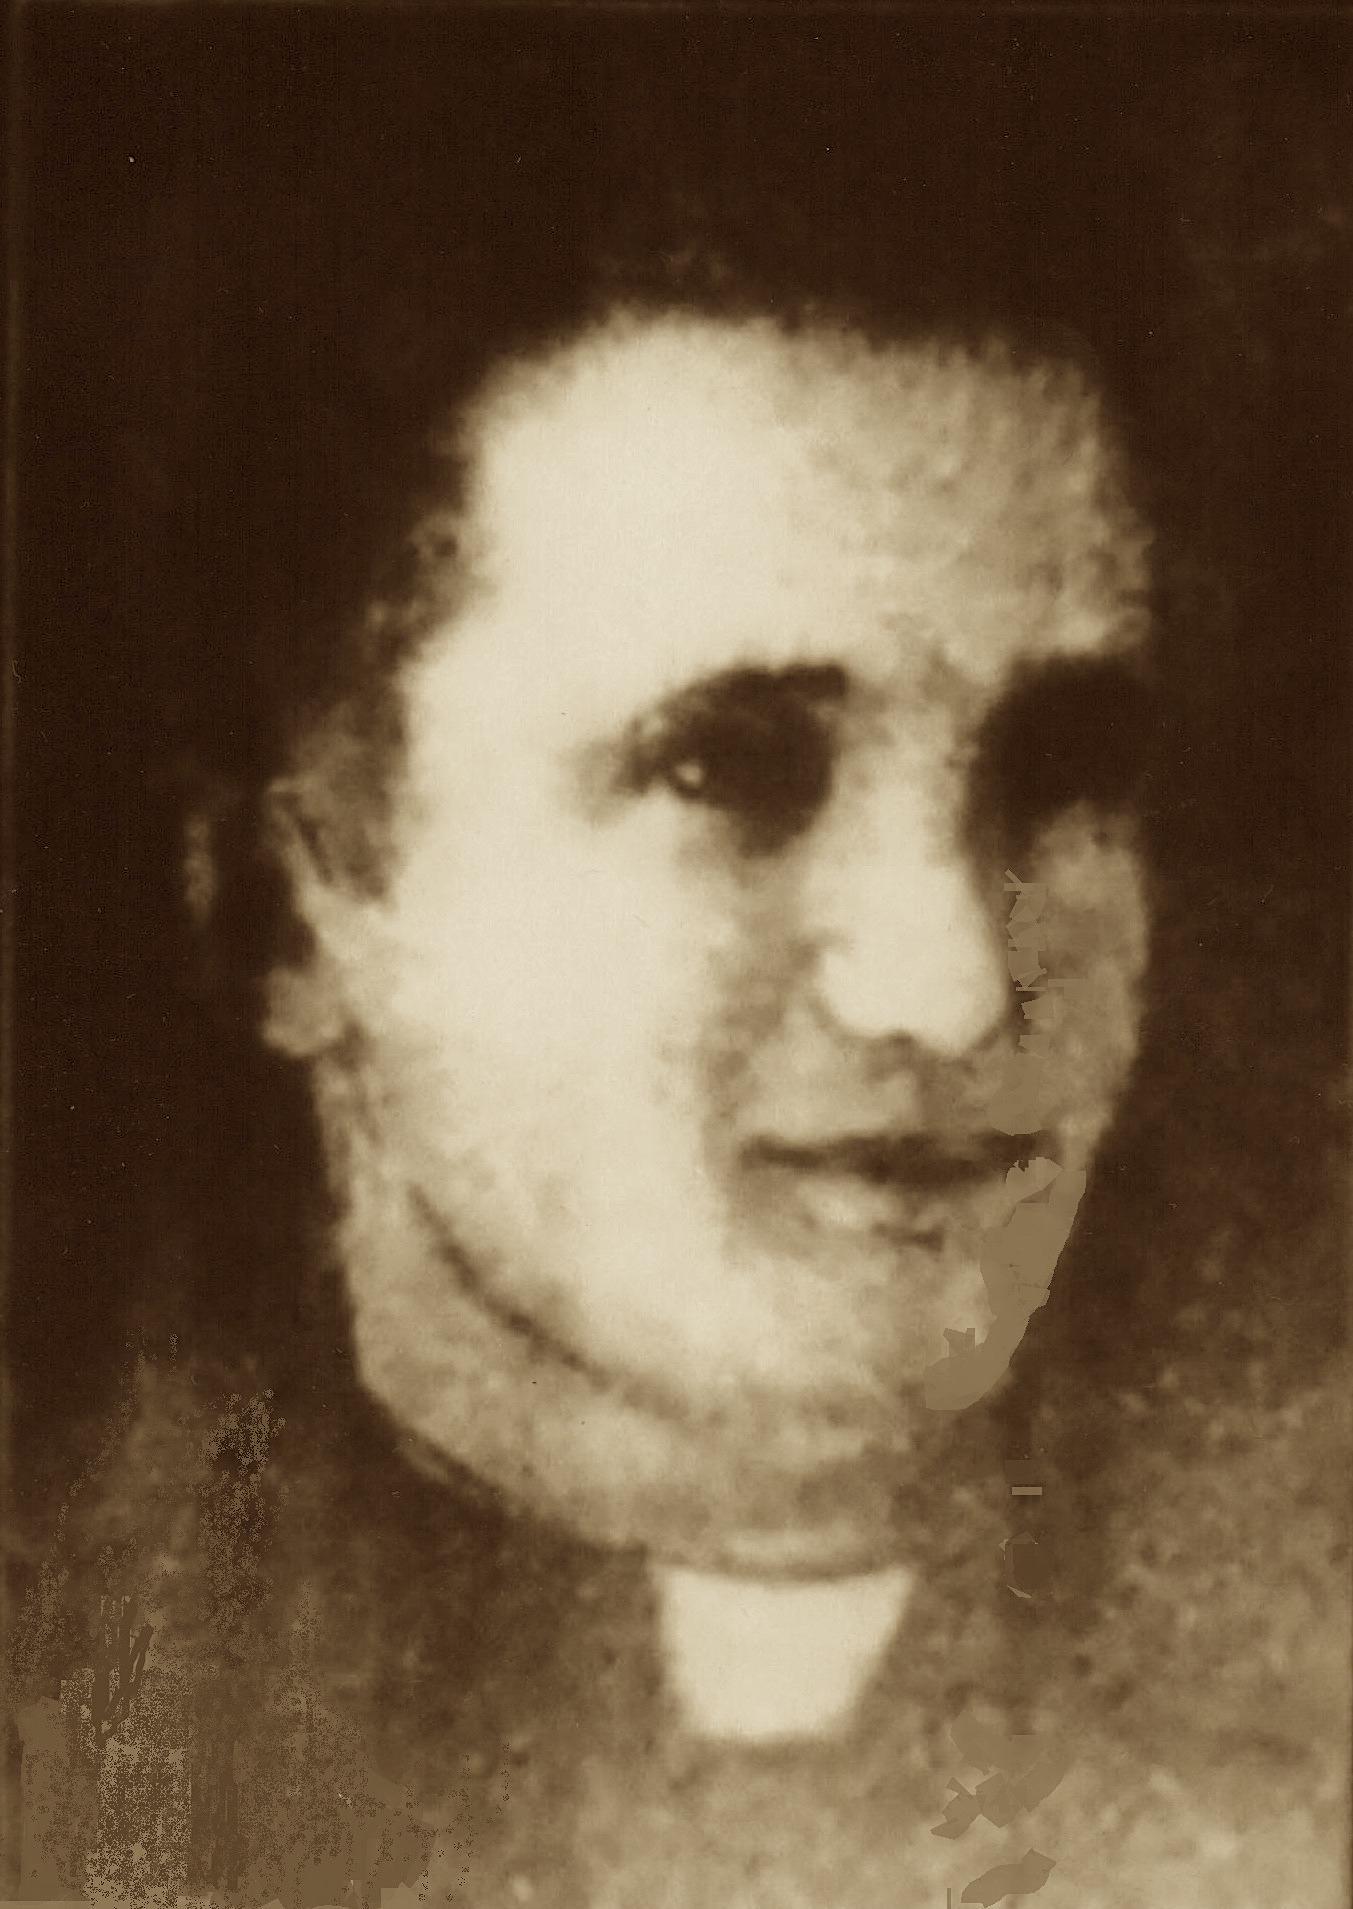 Ejell Kovaçi (1920-1958)